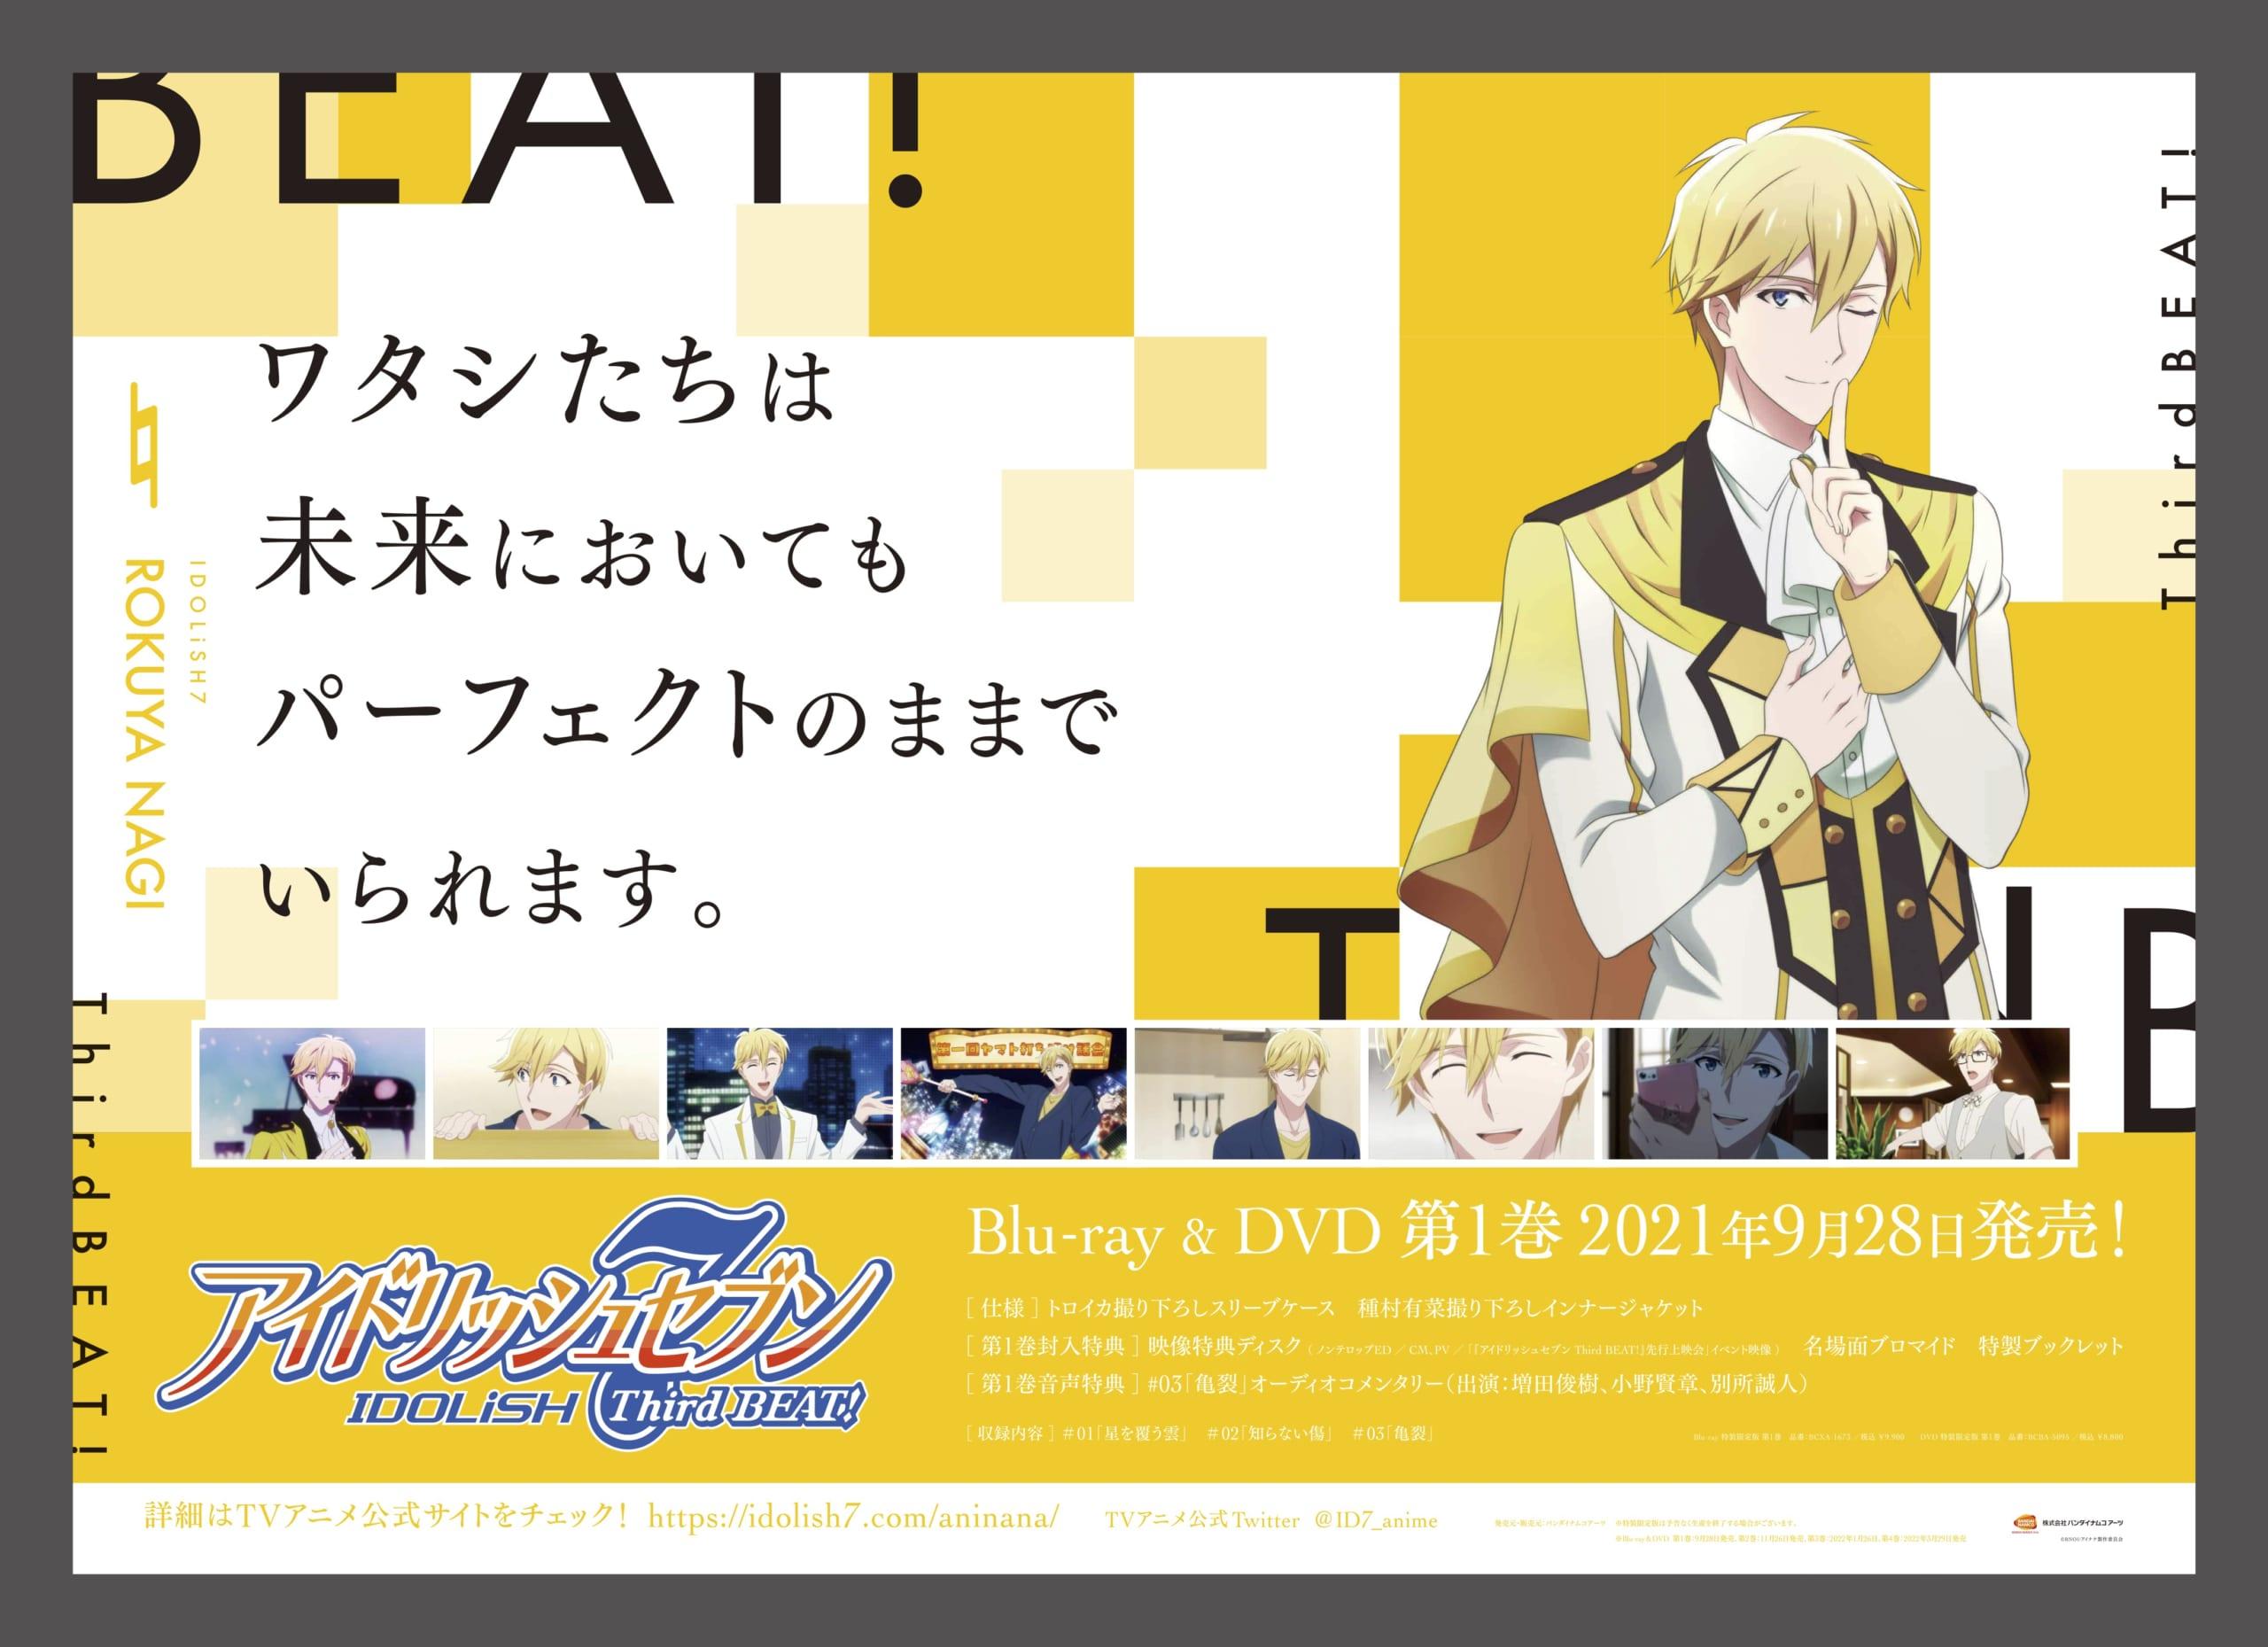 TVアニメ「アイドリッシュセブン Third BEAT!」駅広告六弥ナギ